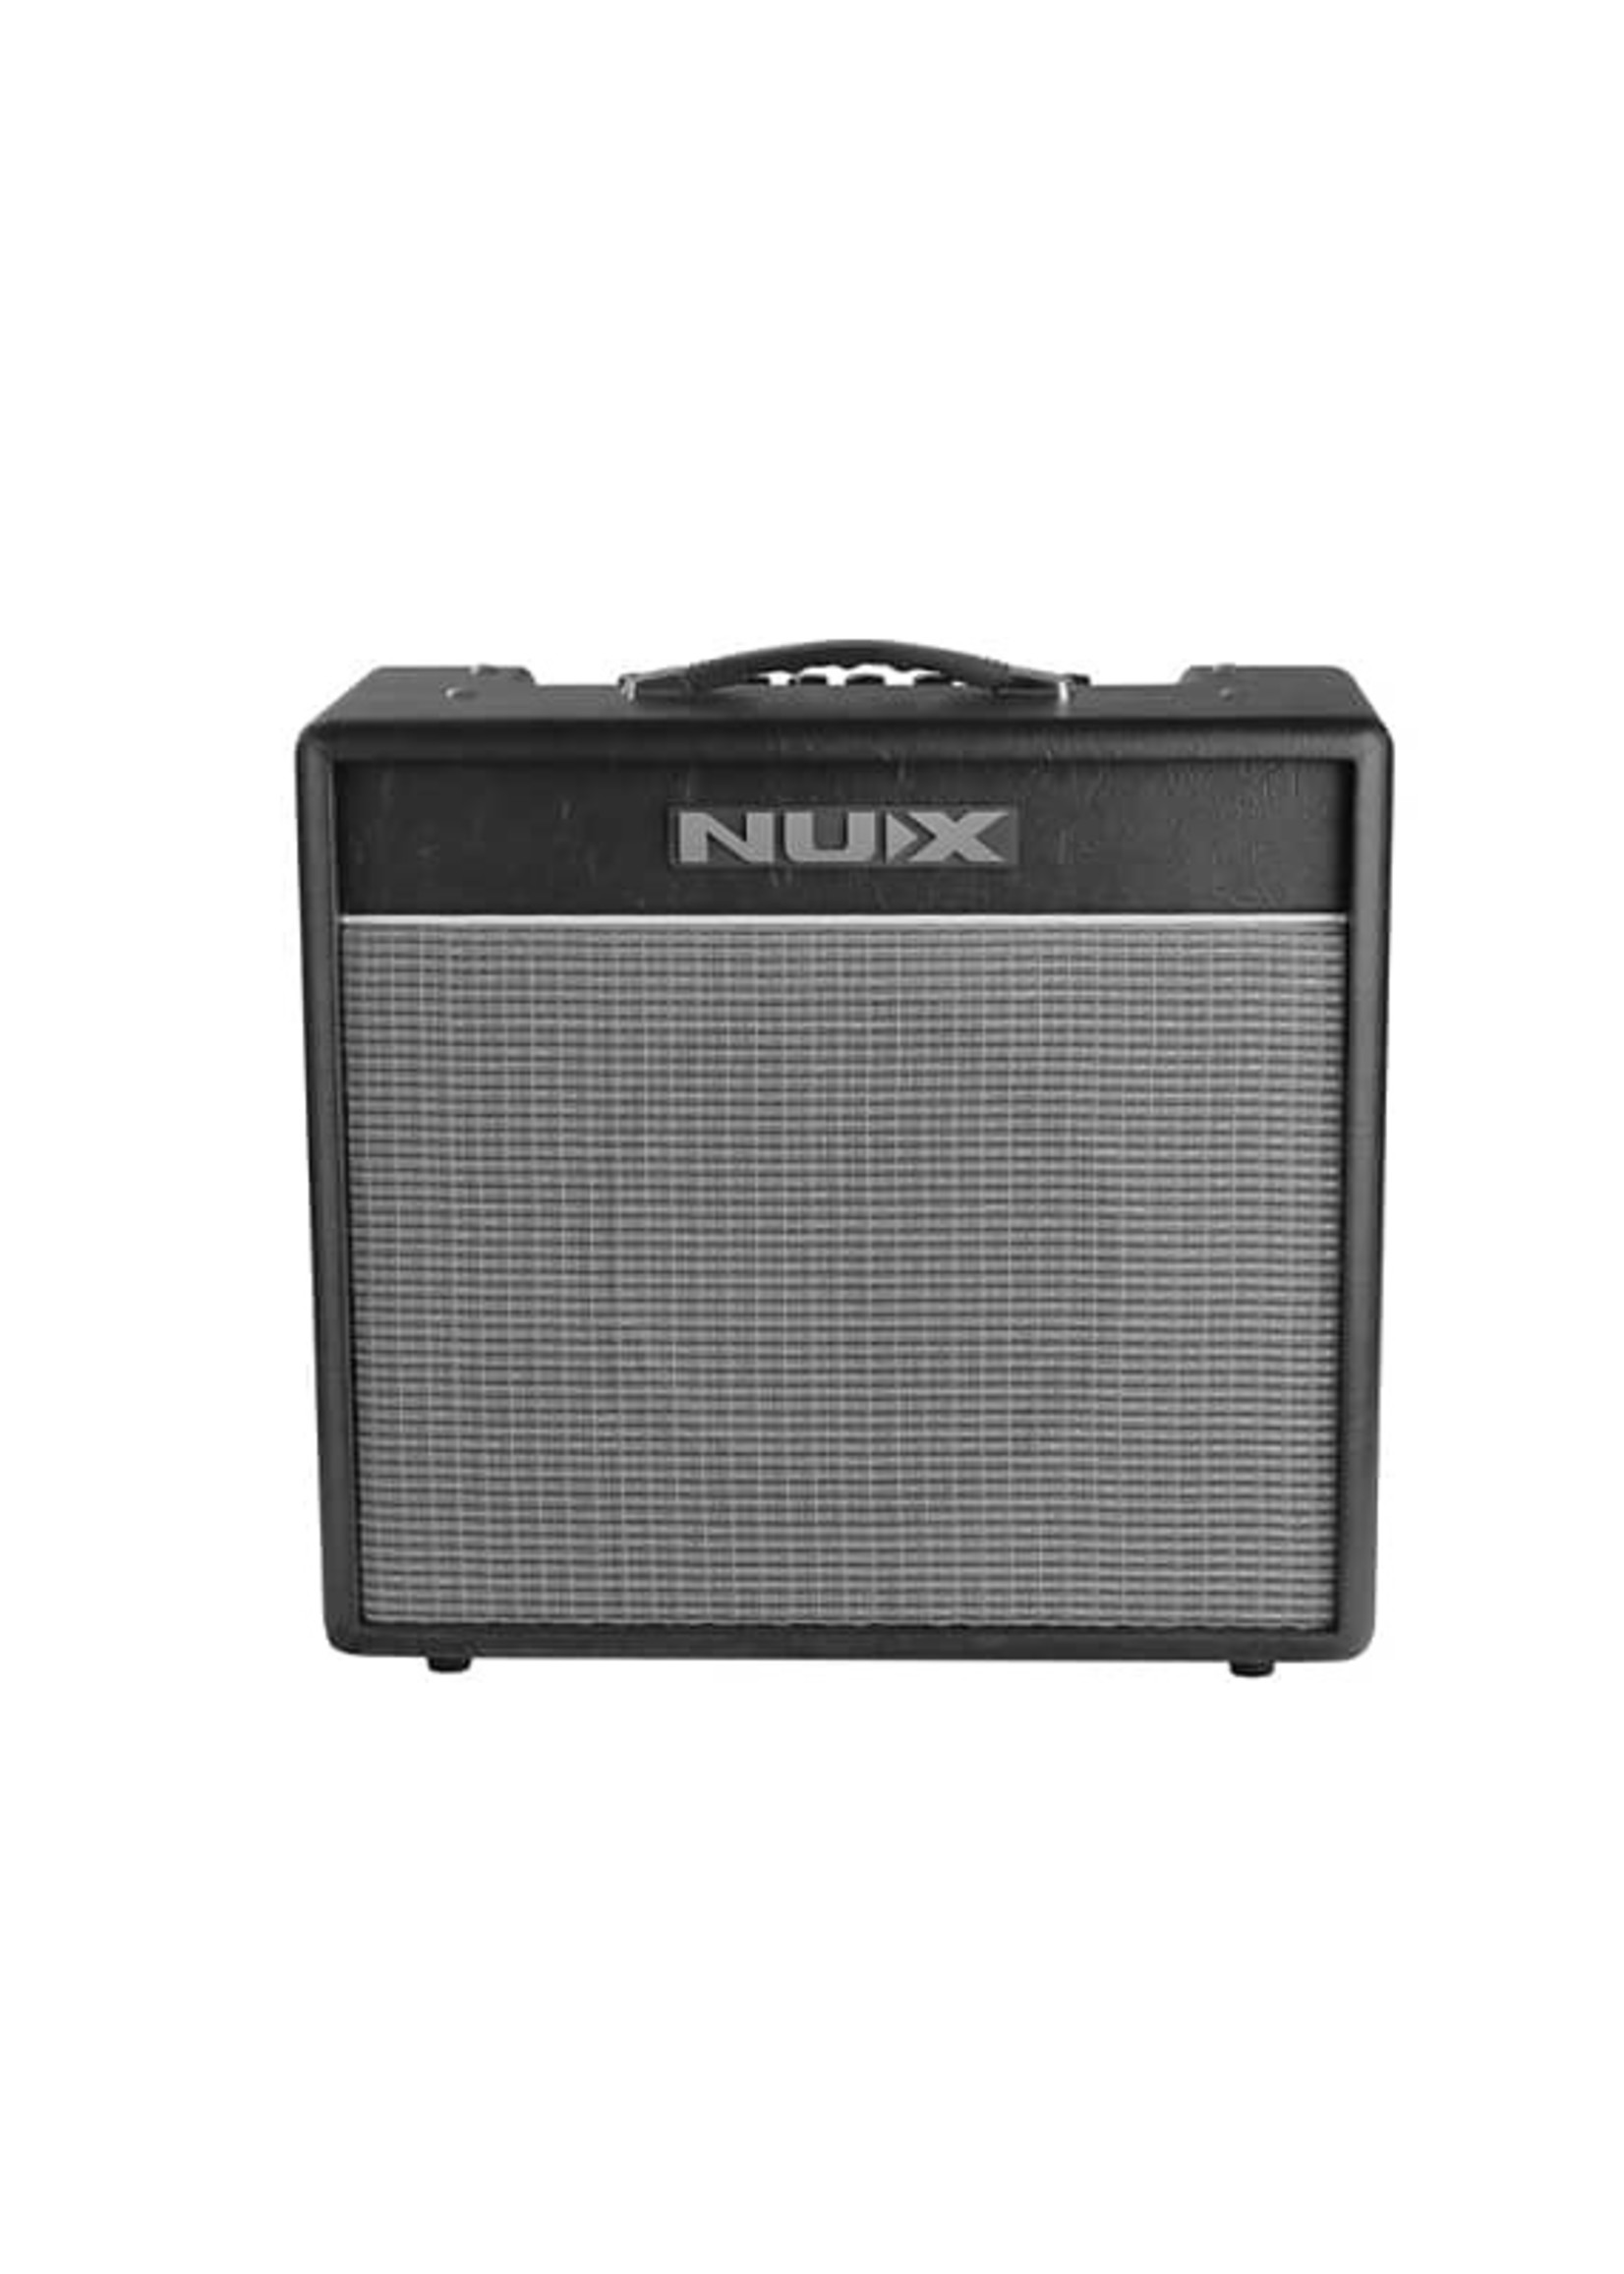 NuX NuX Mighty 40 BT Guitar Amplifier